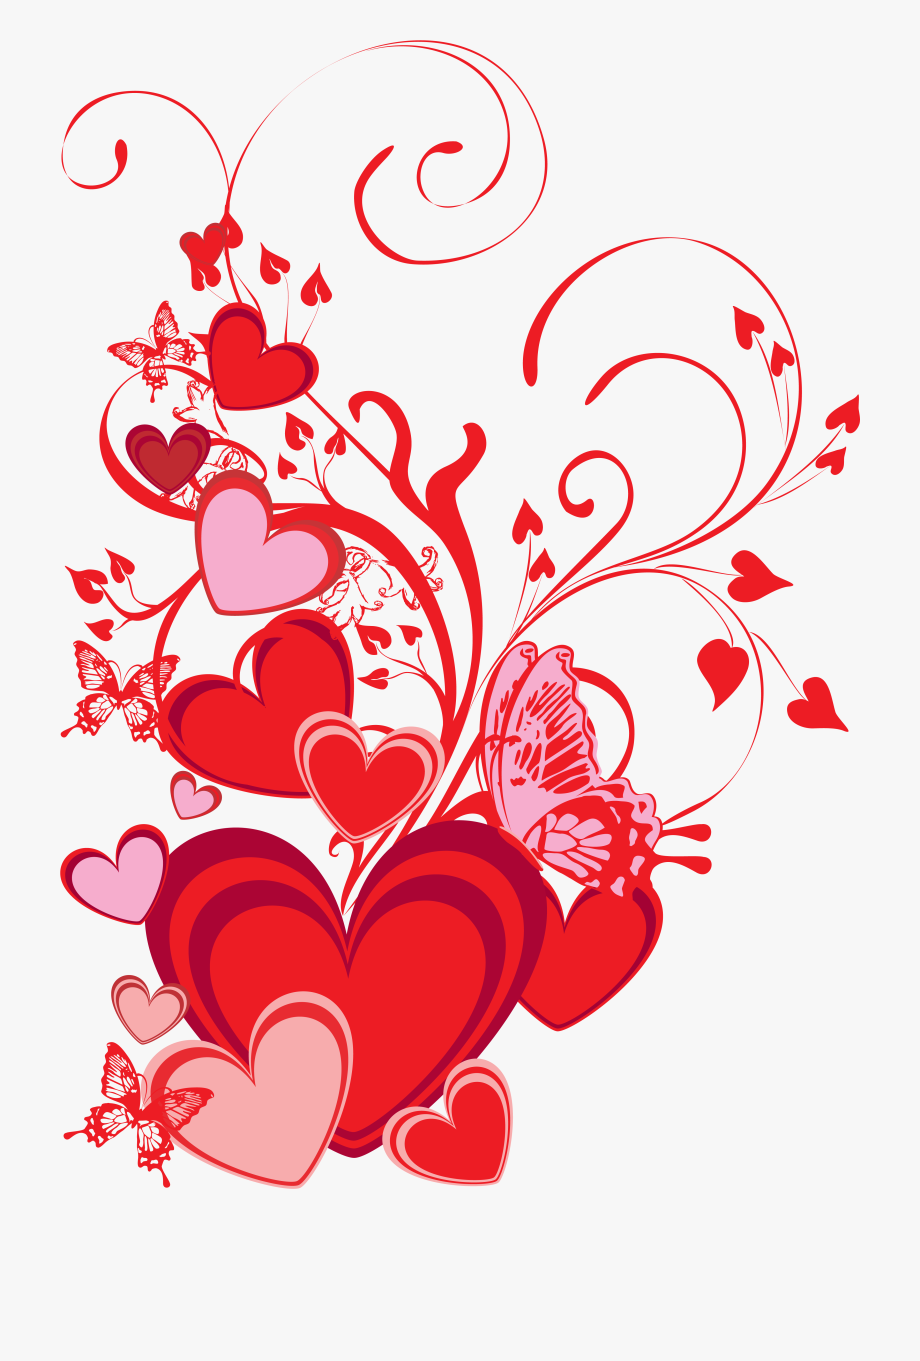 Valentines card design clipart jpg royalty free stock Clipart Heart Butterflies - Valentines Card Design ... jpg royalty free stock